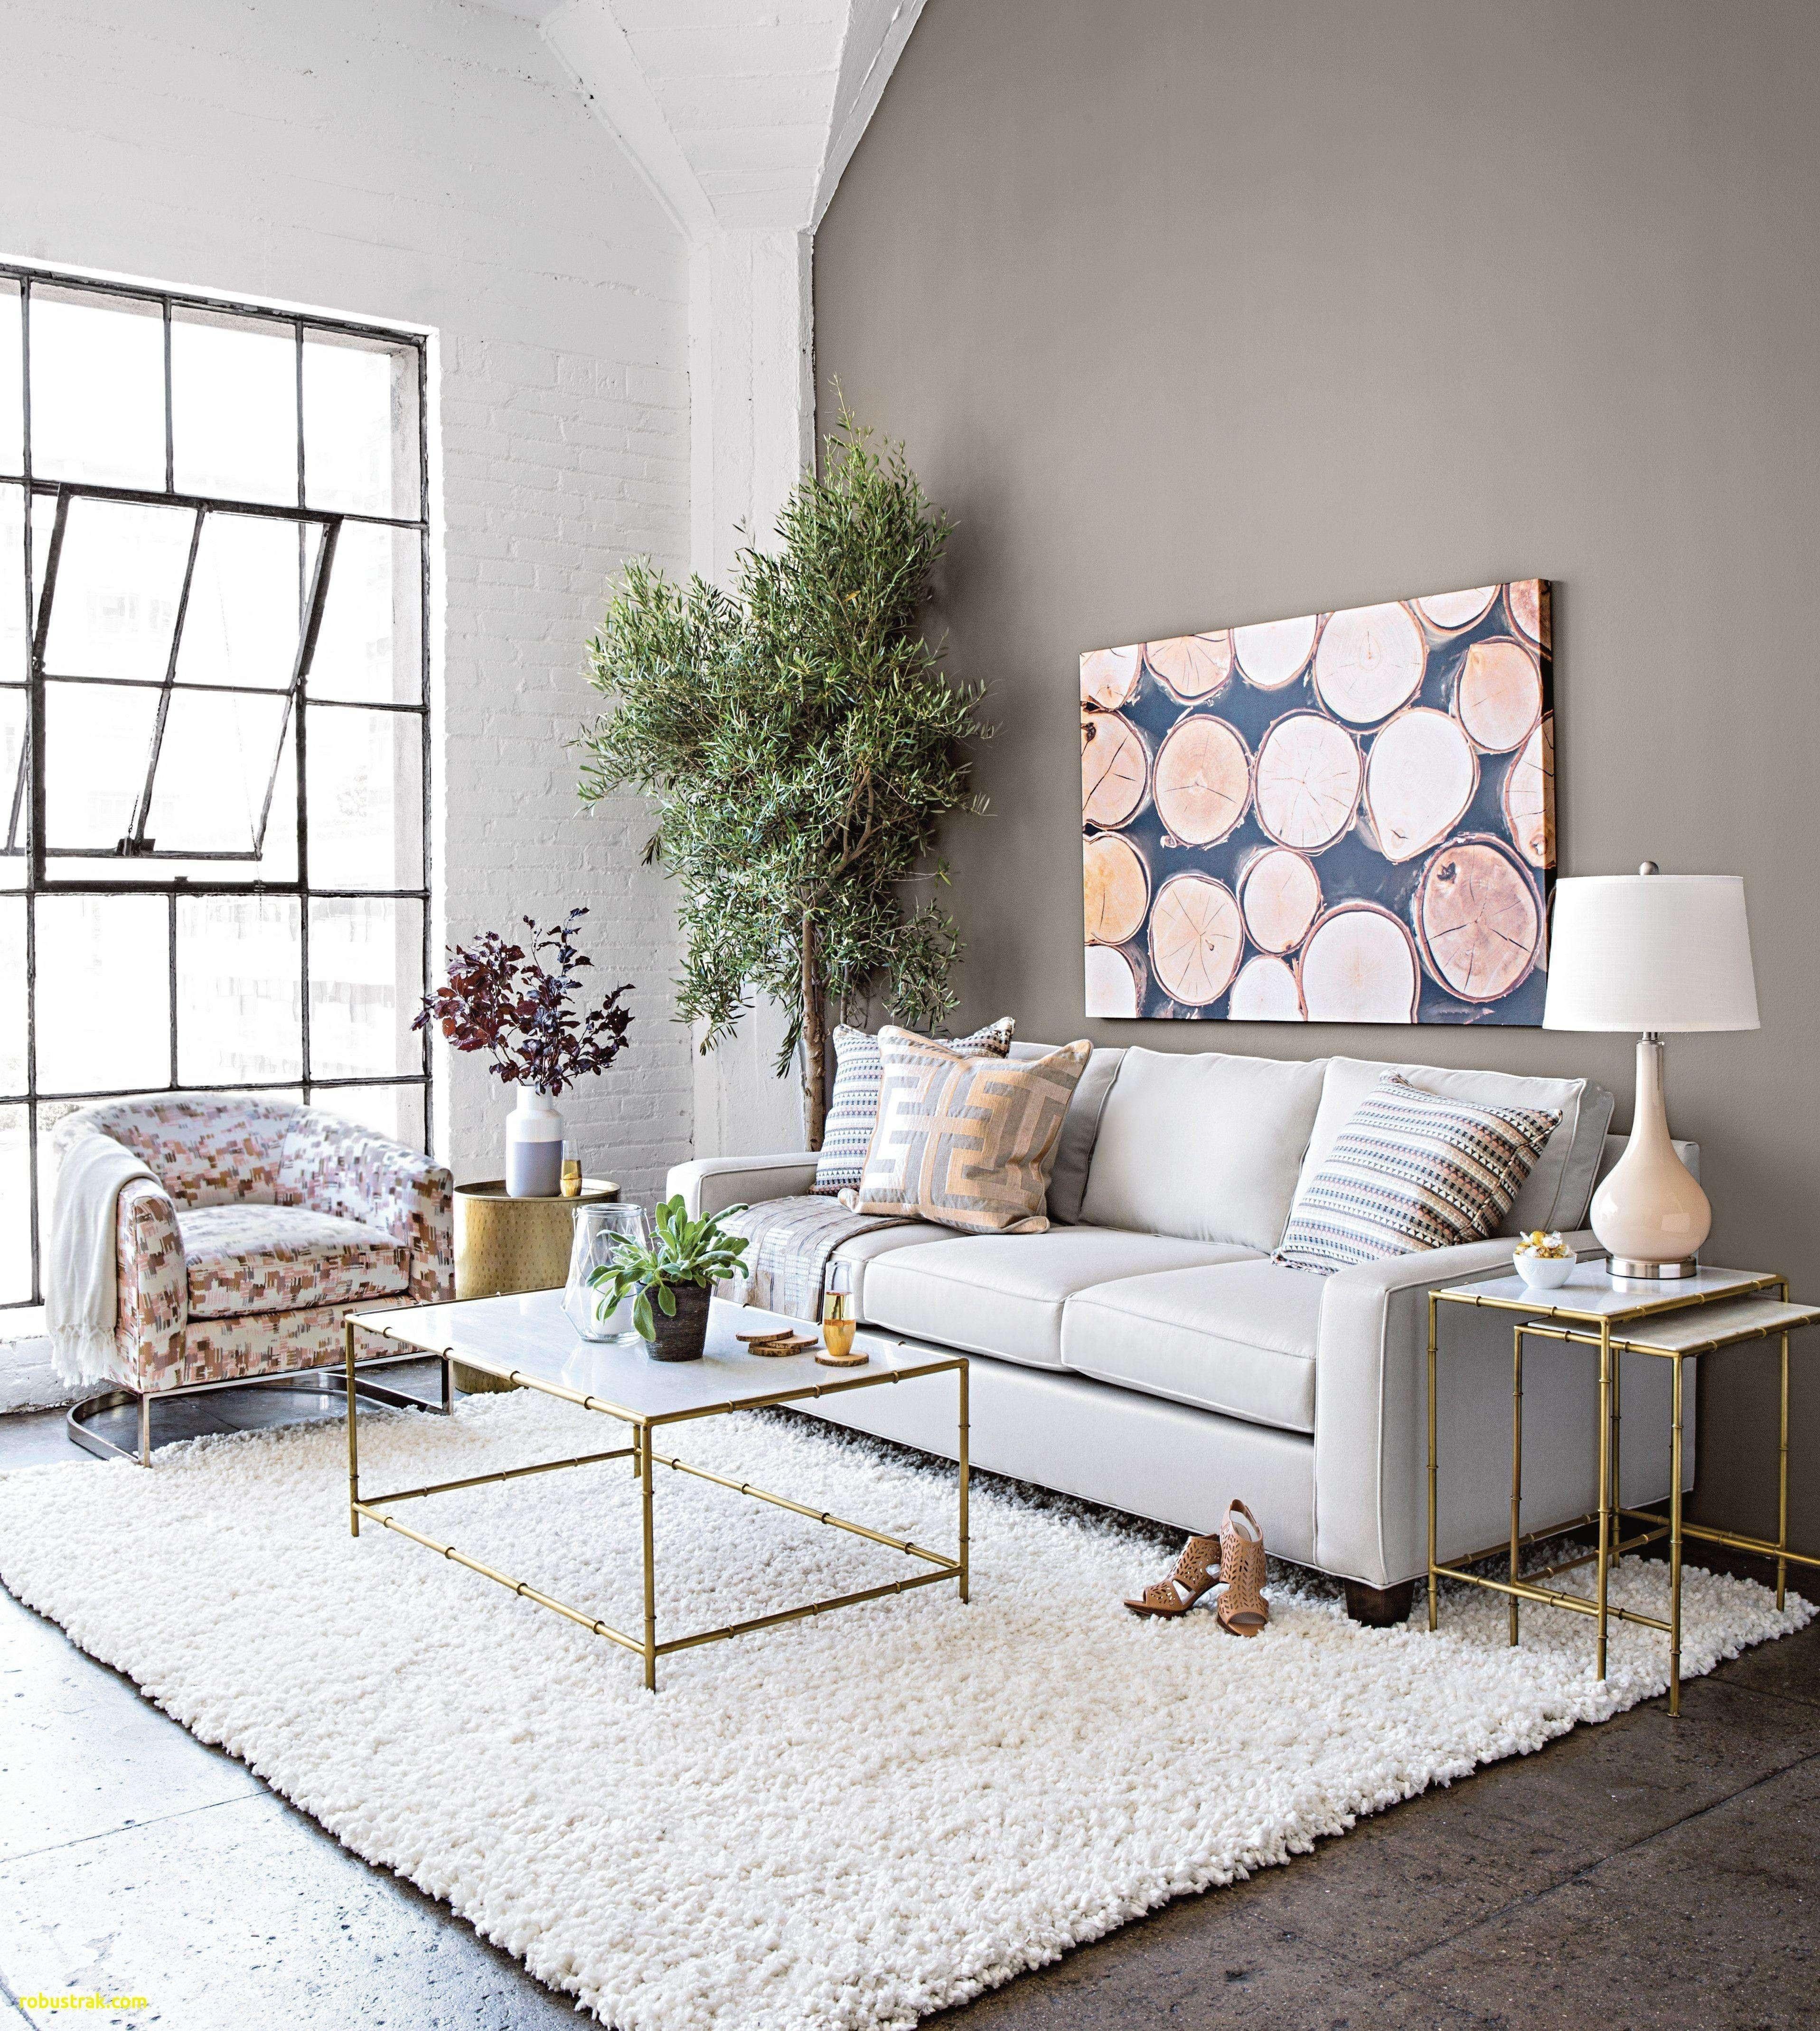 Living Room : 41 Paintings For Living Room Unusual Top Framed Wall regarding Unusual Wall Art (Image 5 of 20)